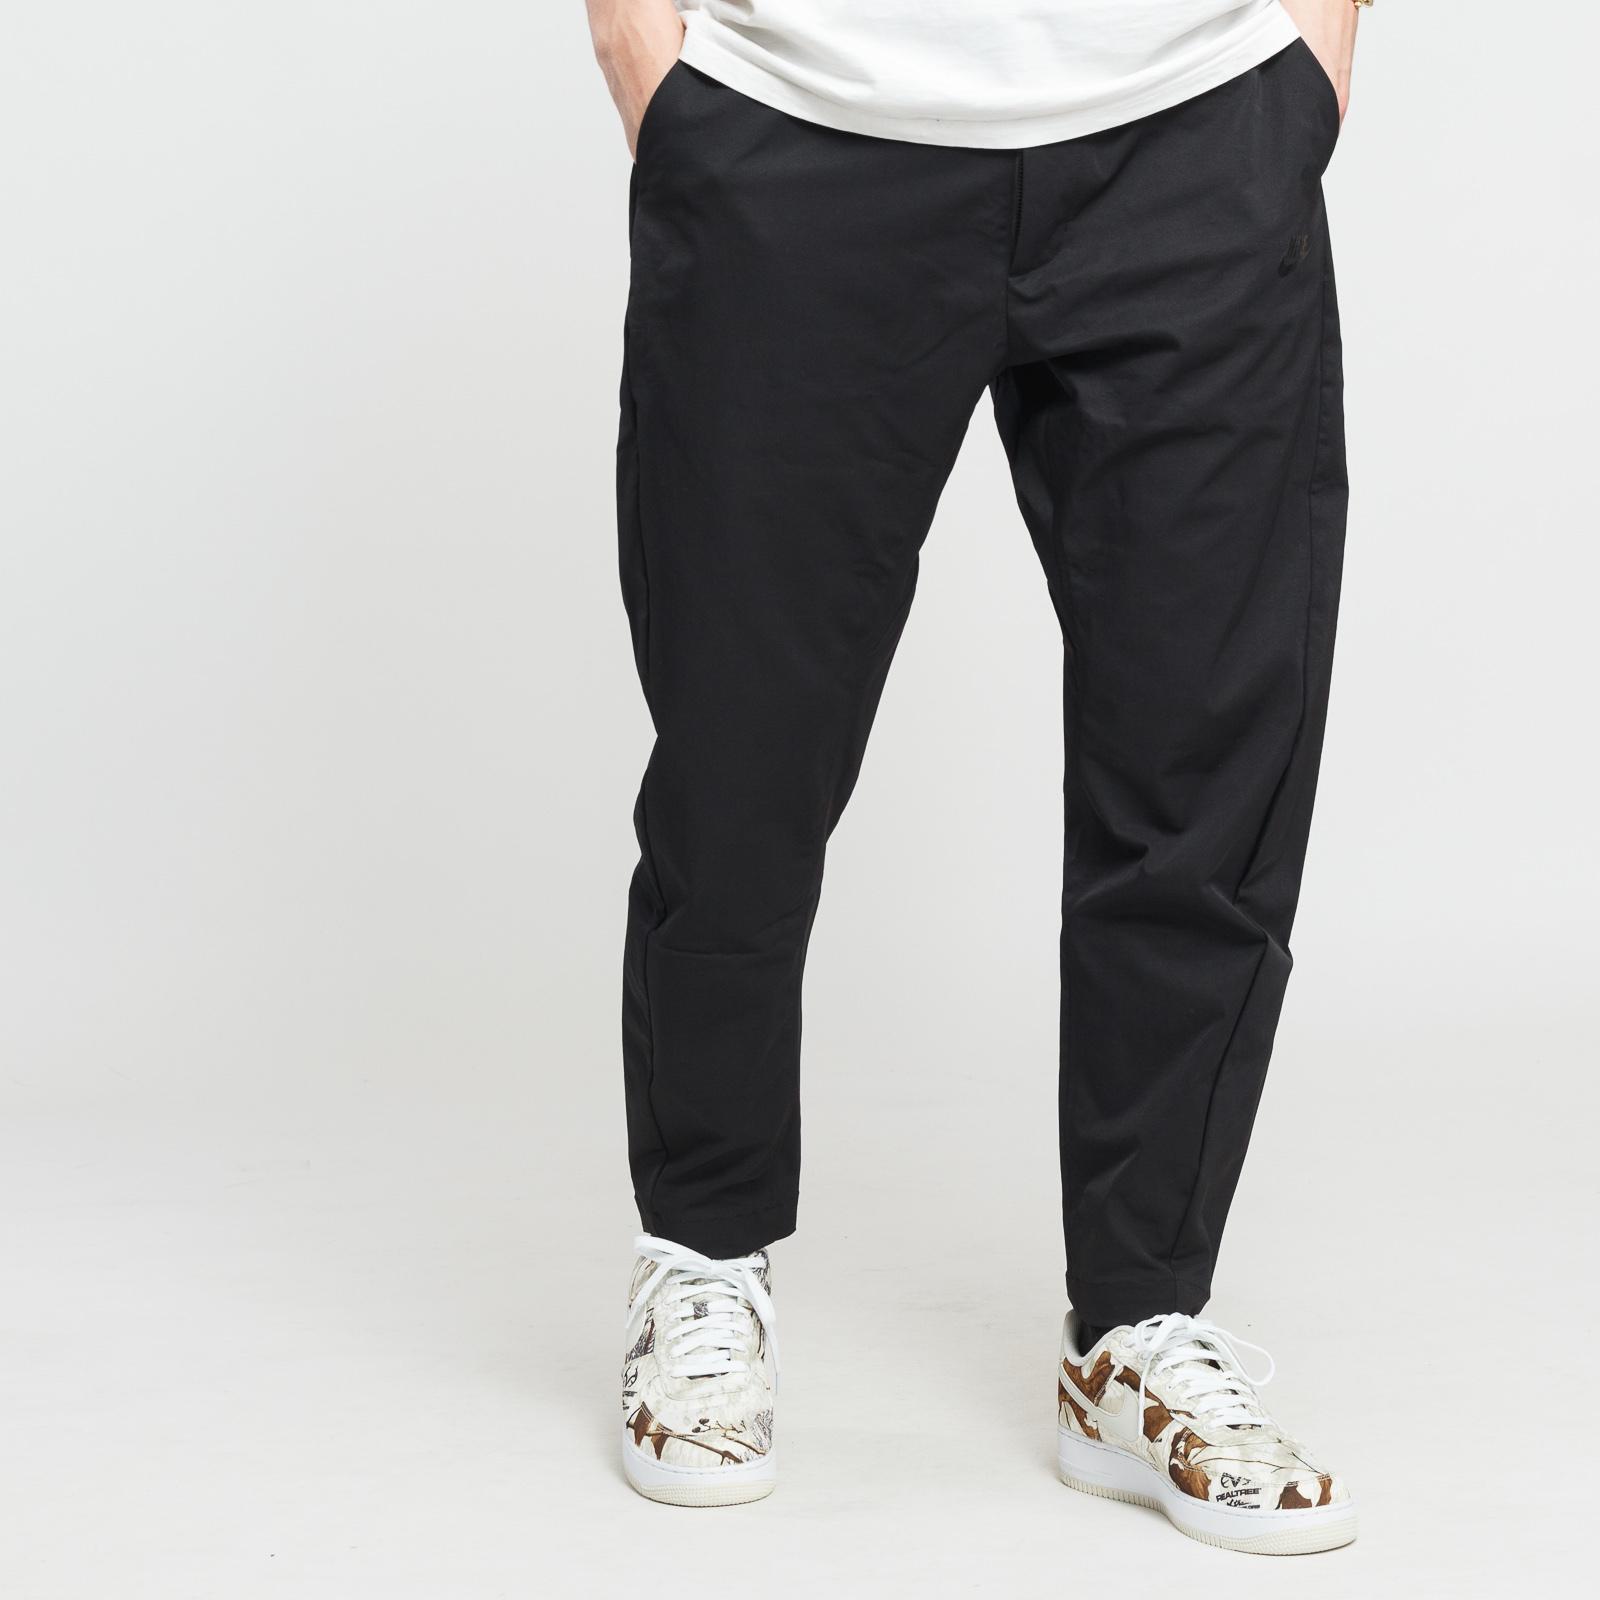 15b2c593f Nike M NSW PE Pant Woven čierne - Glami.sk